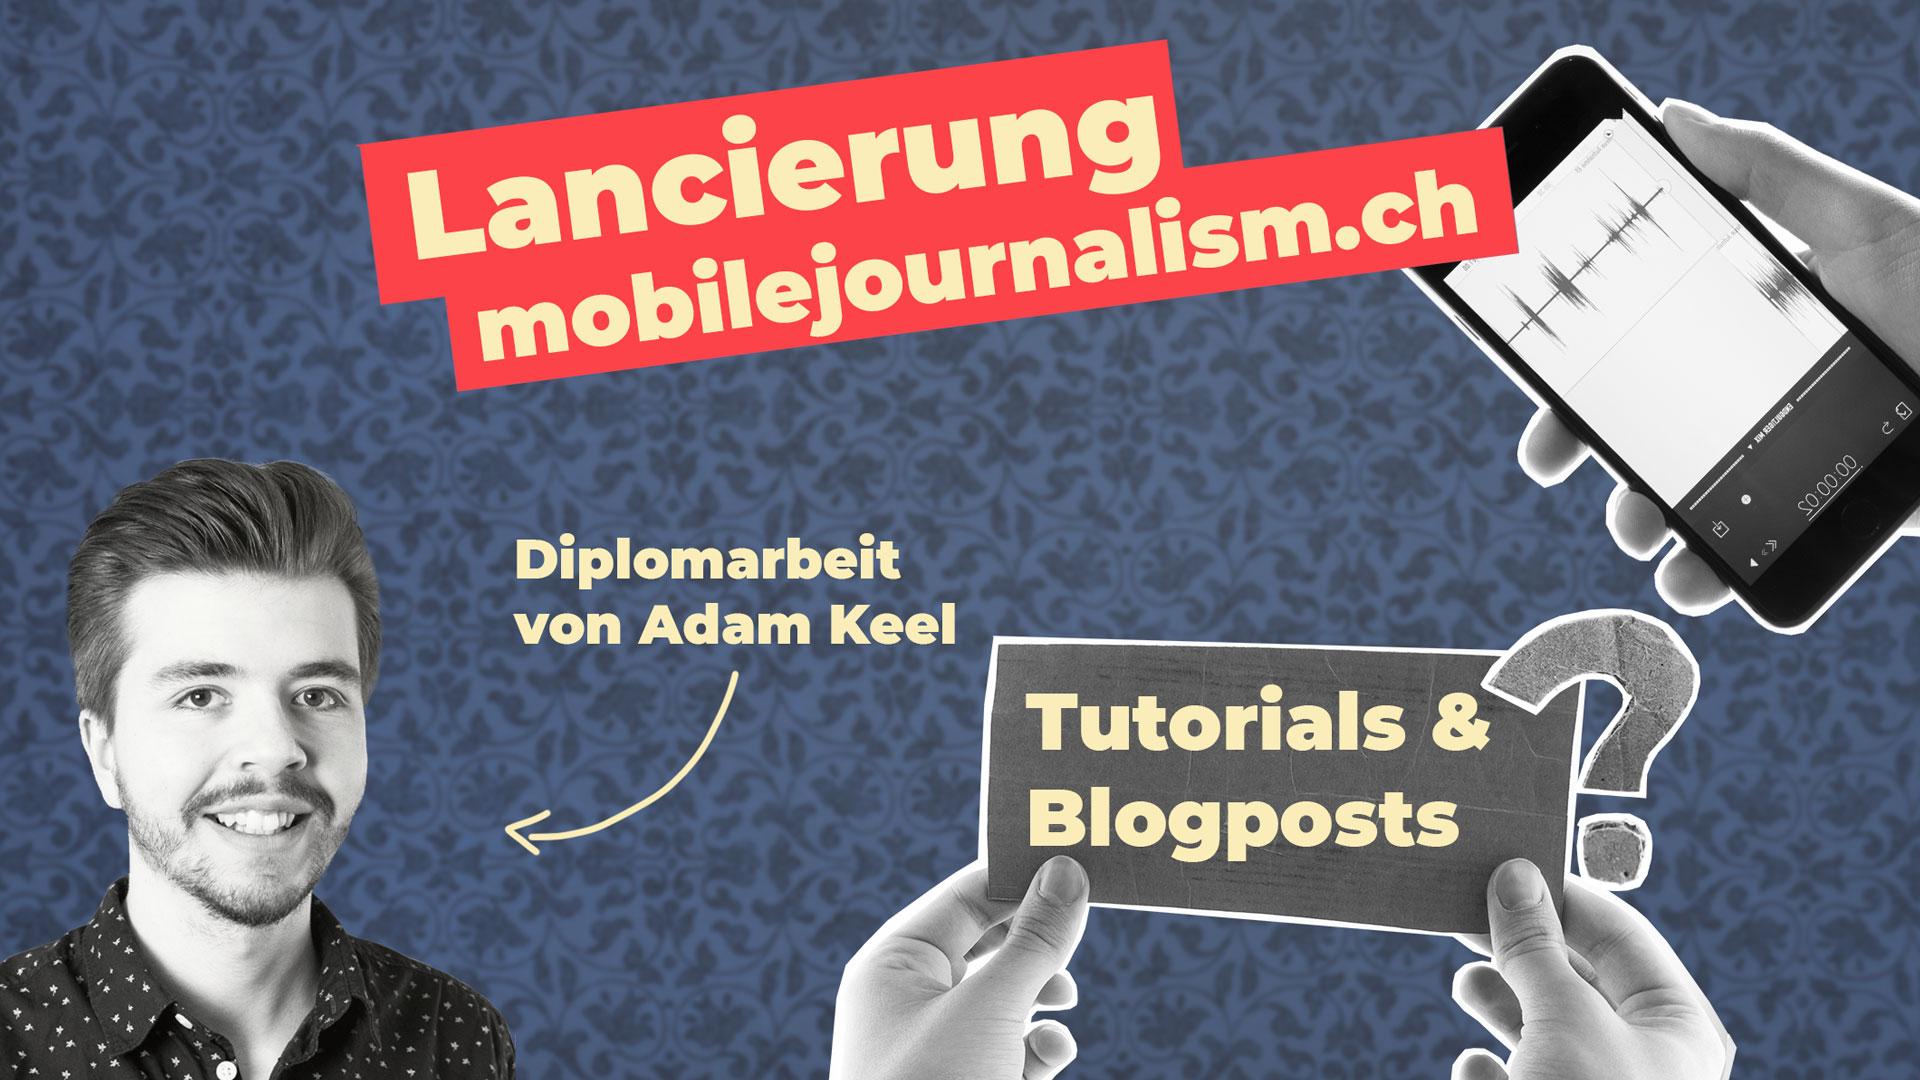 jjs_blog_bild_mobilejournalism.jpg